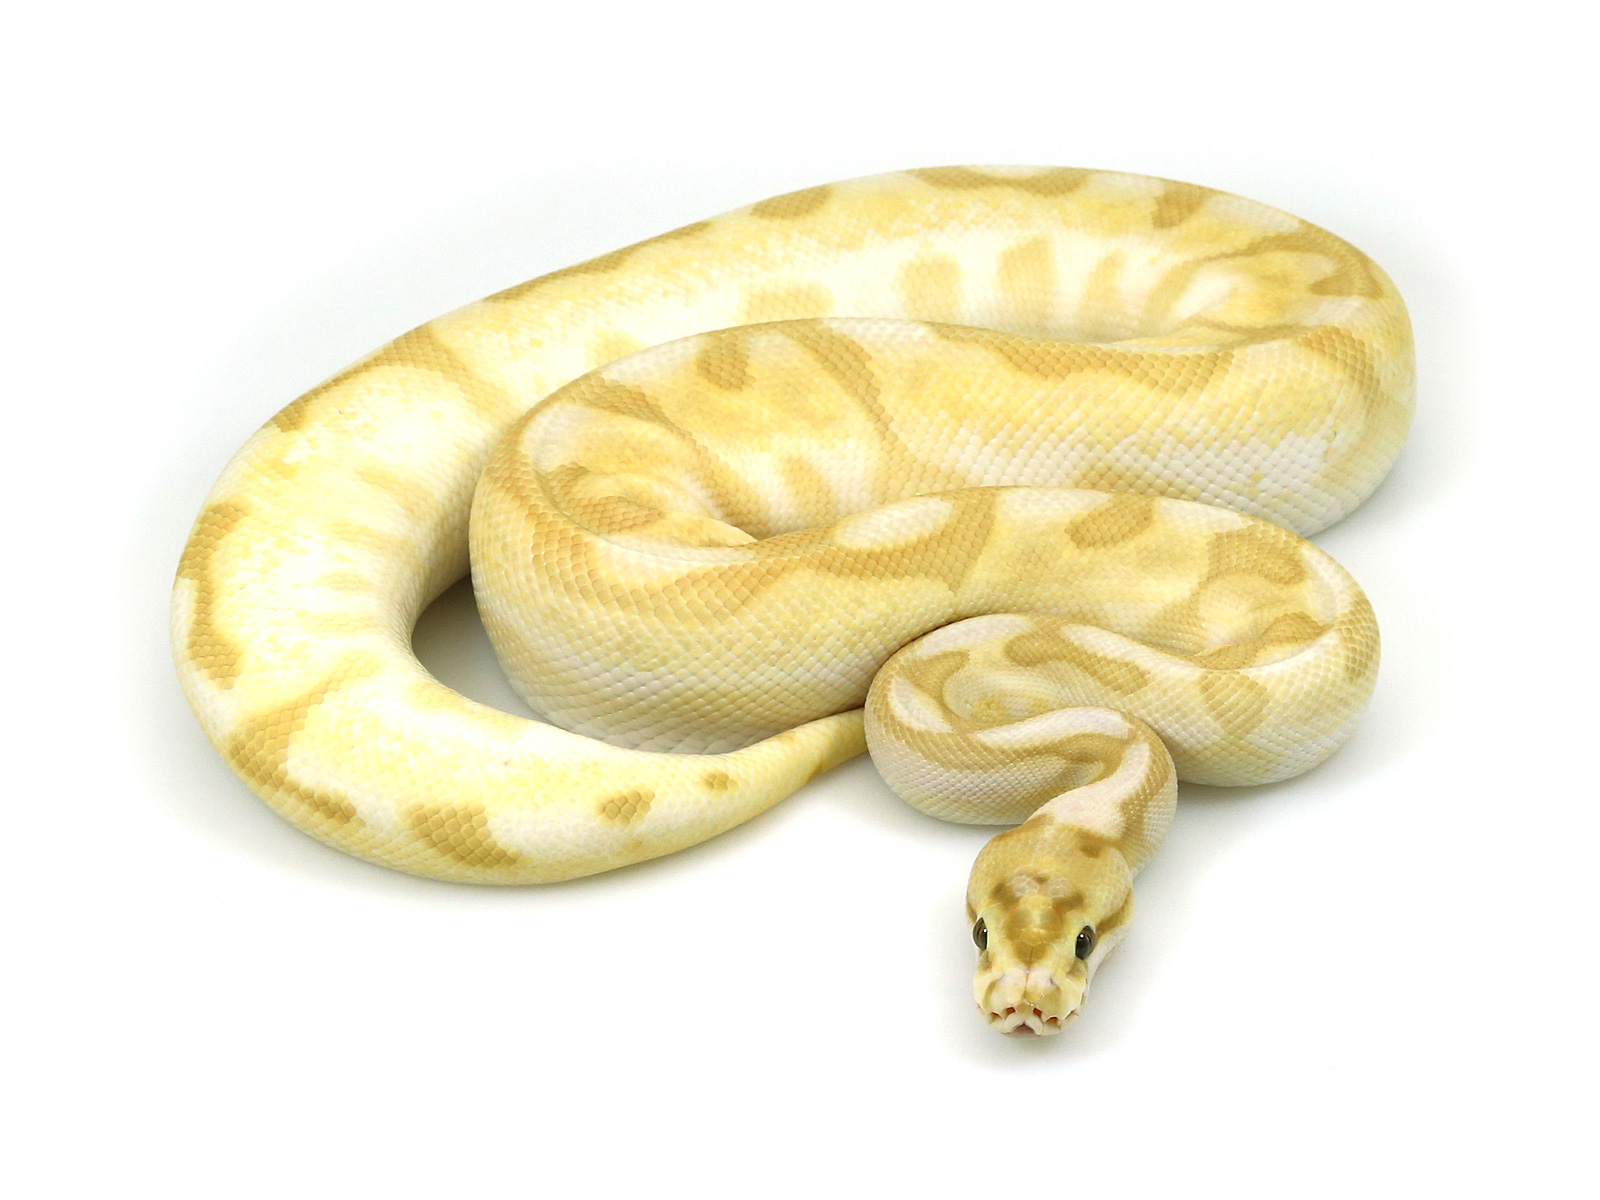 ball python, banana butter enchi spider